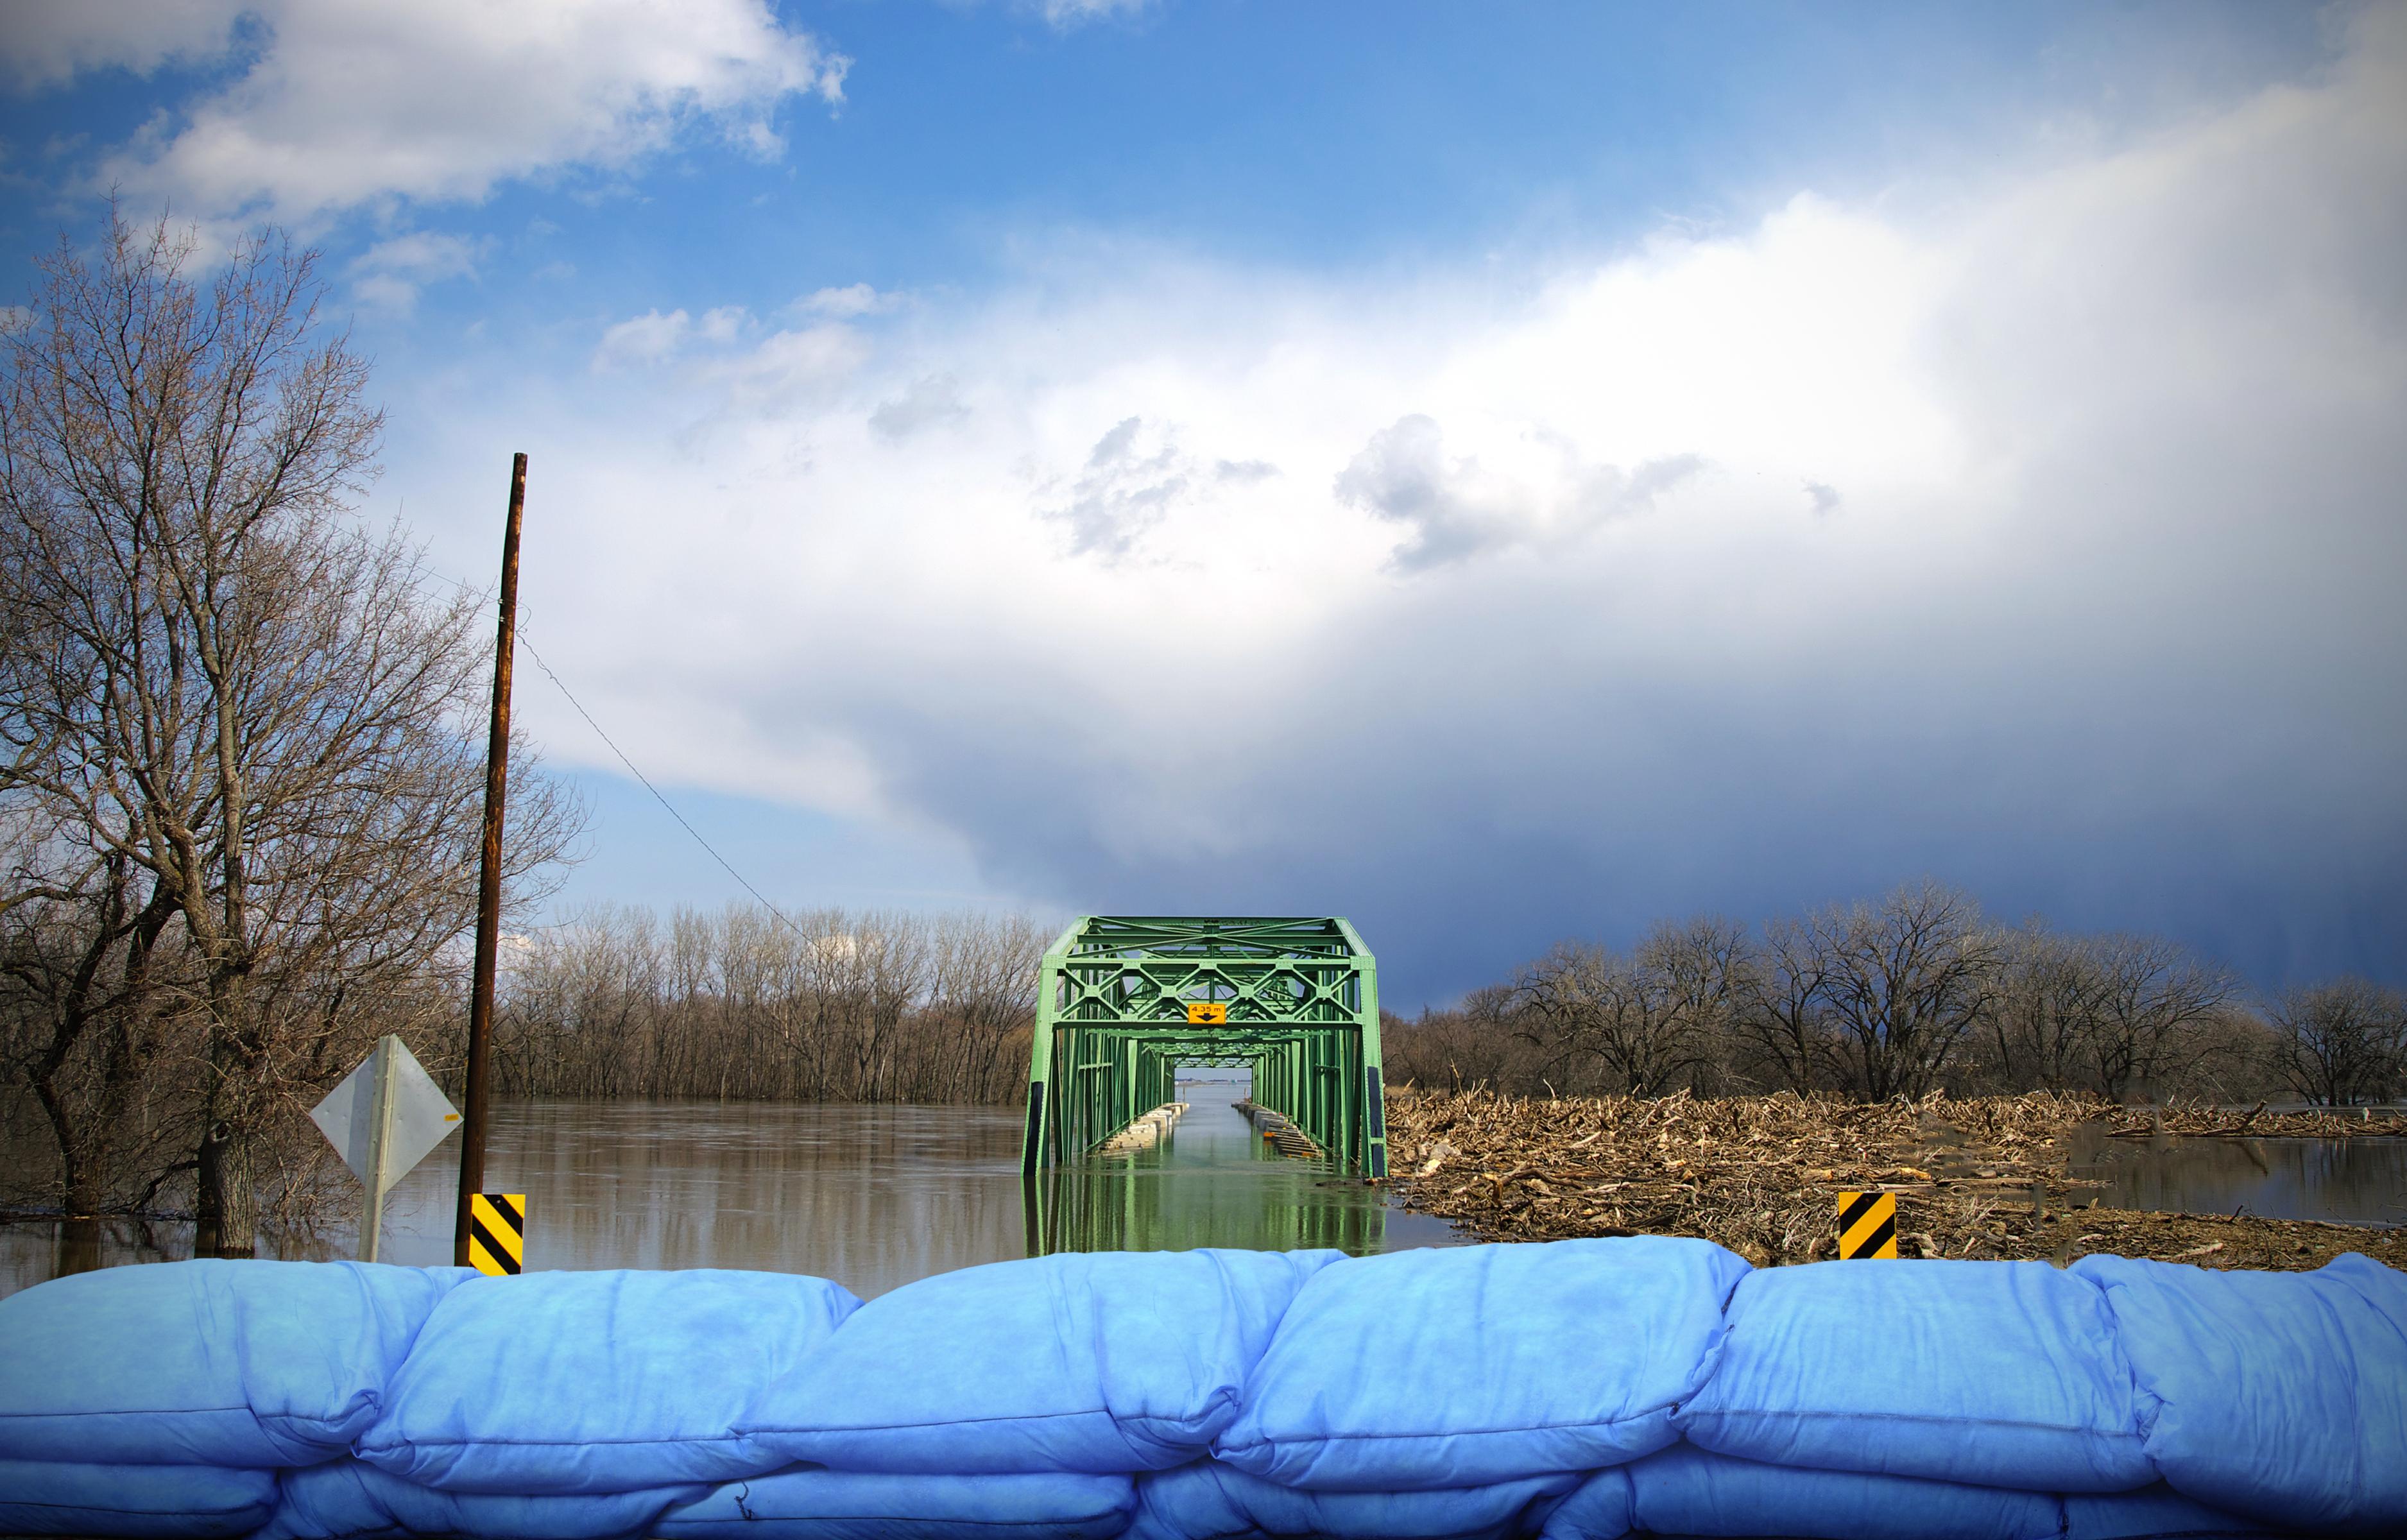 5400-aquapads-bridge-flood.jpg